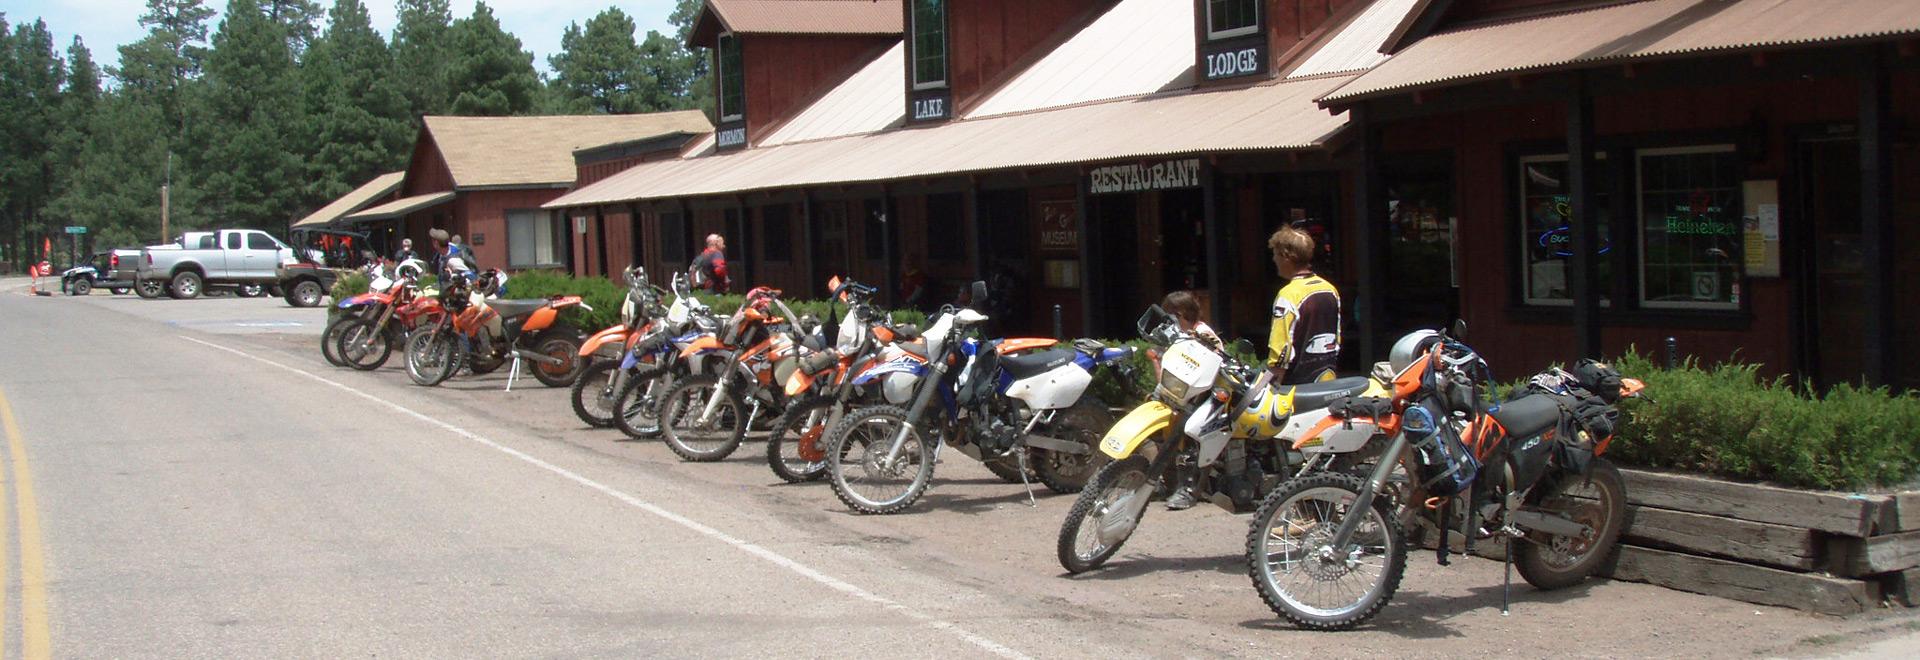 motocross lineup